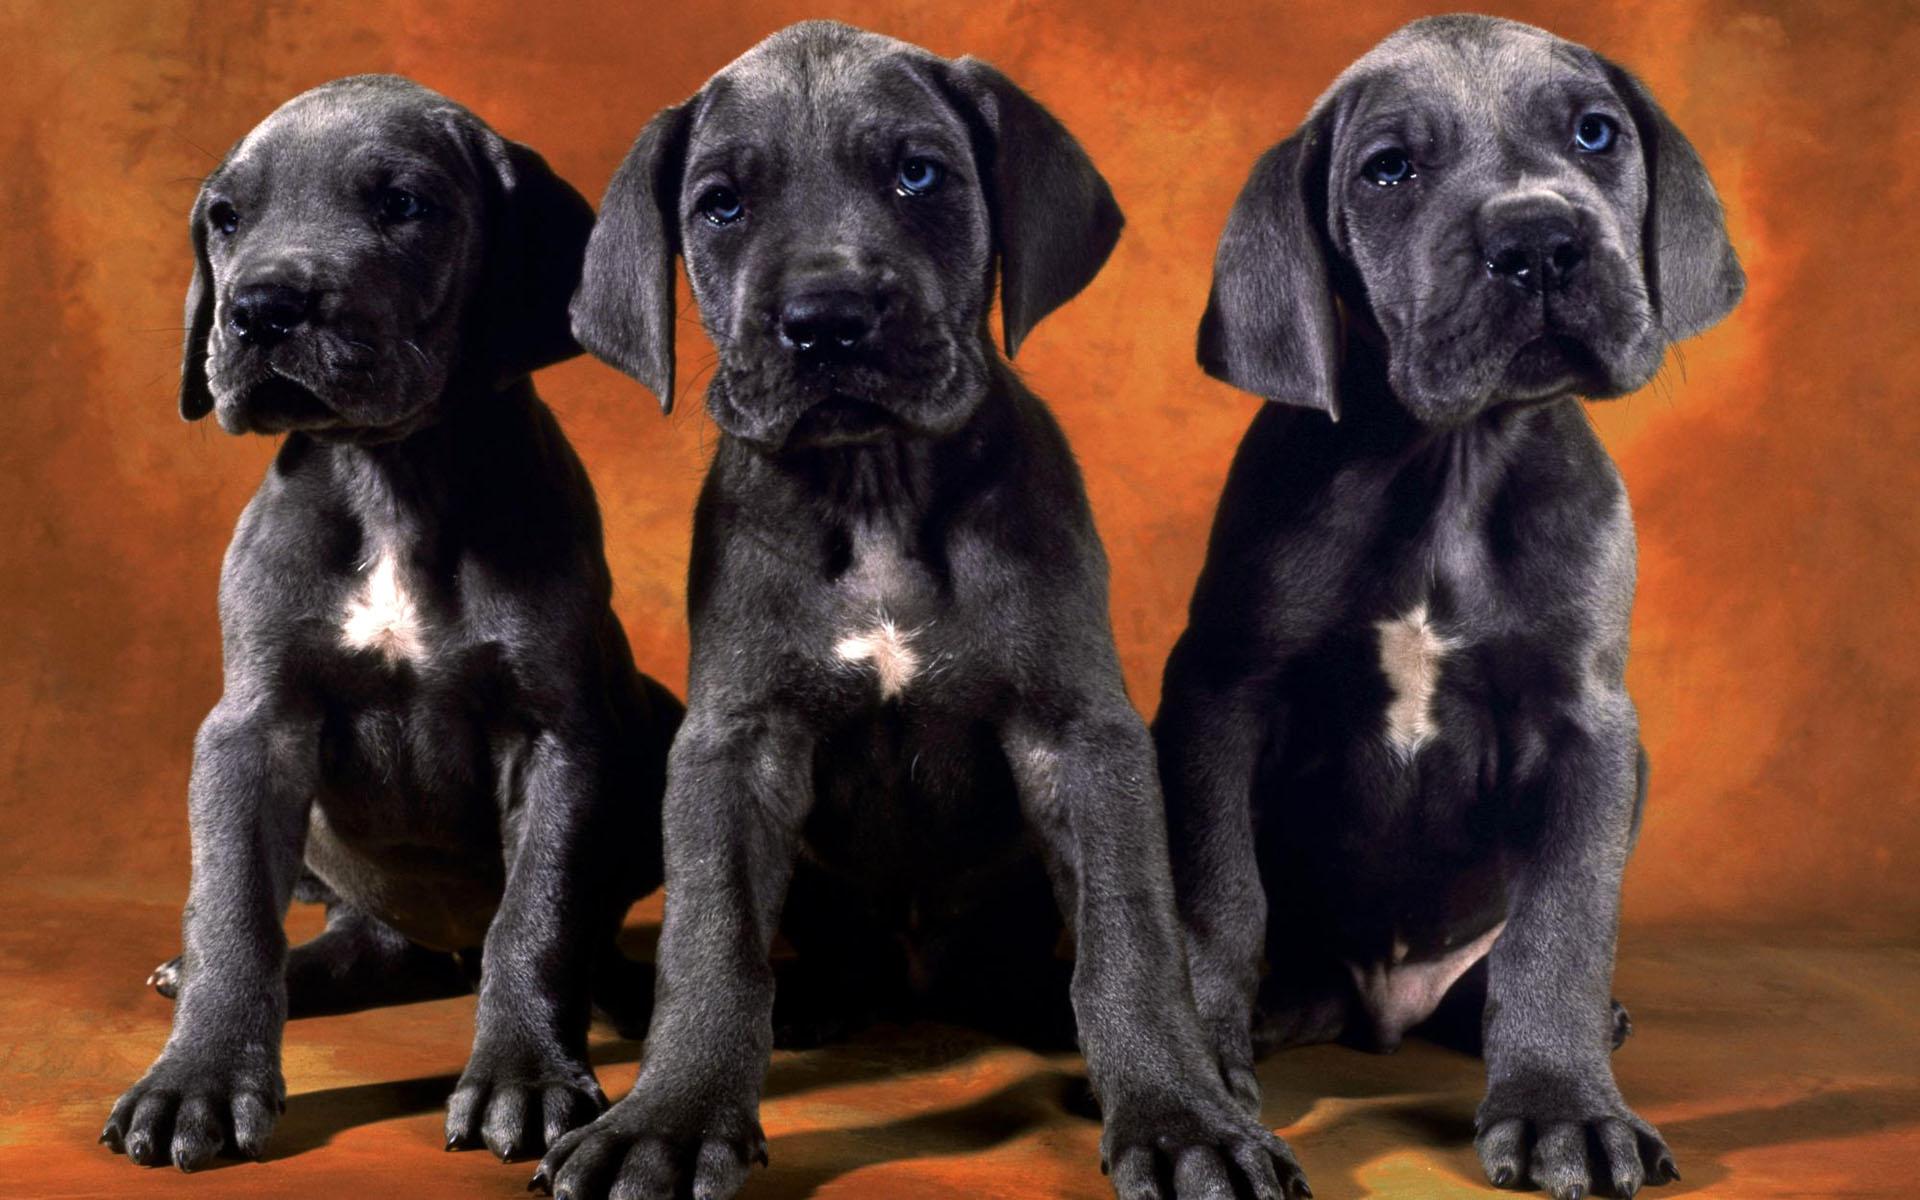 Black Lab Puppies desktop wallpaper 1920x1200